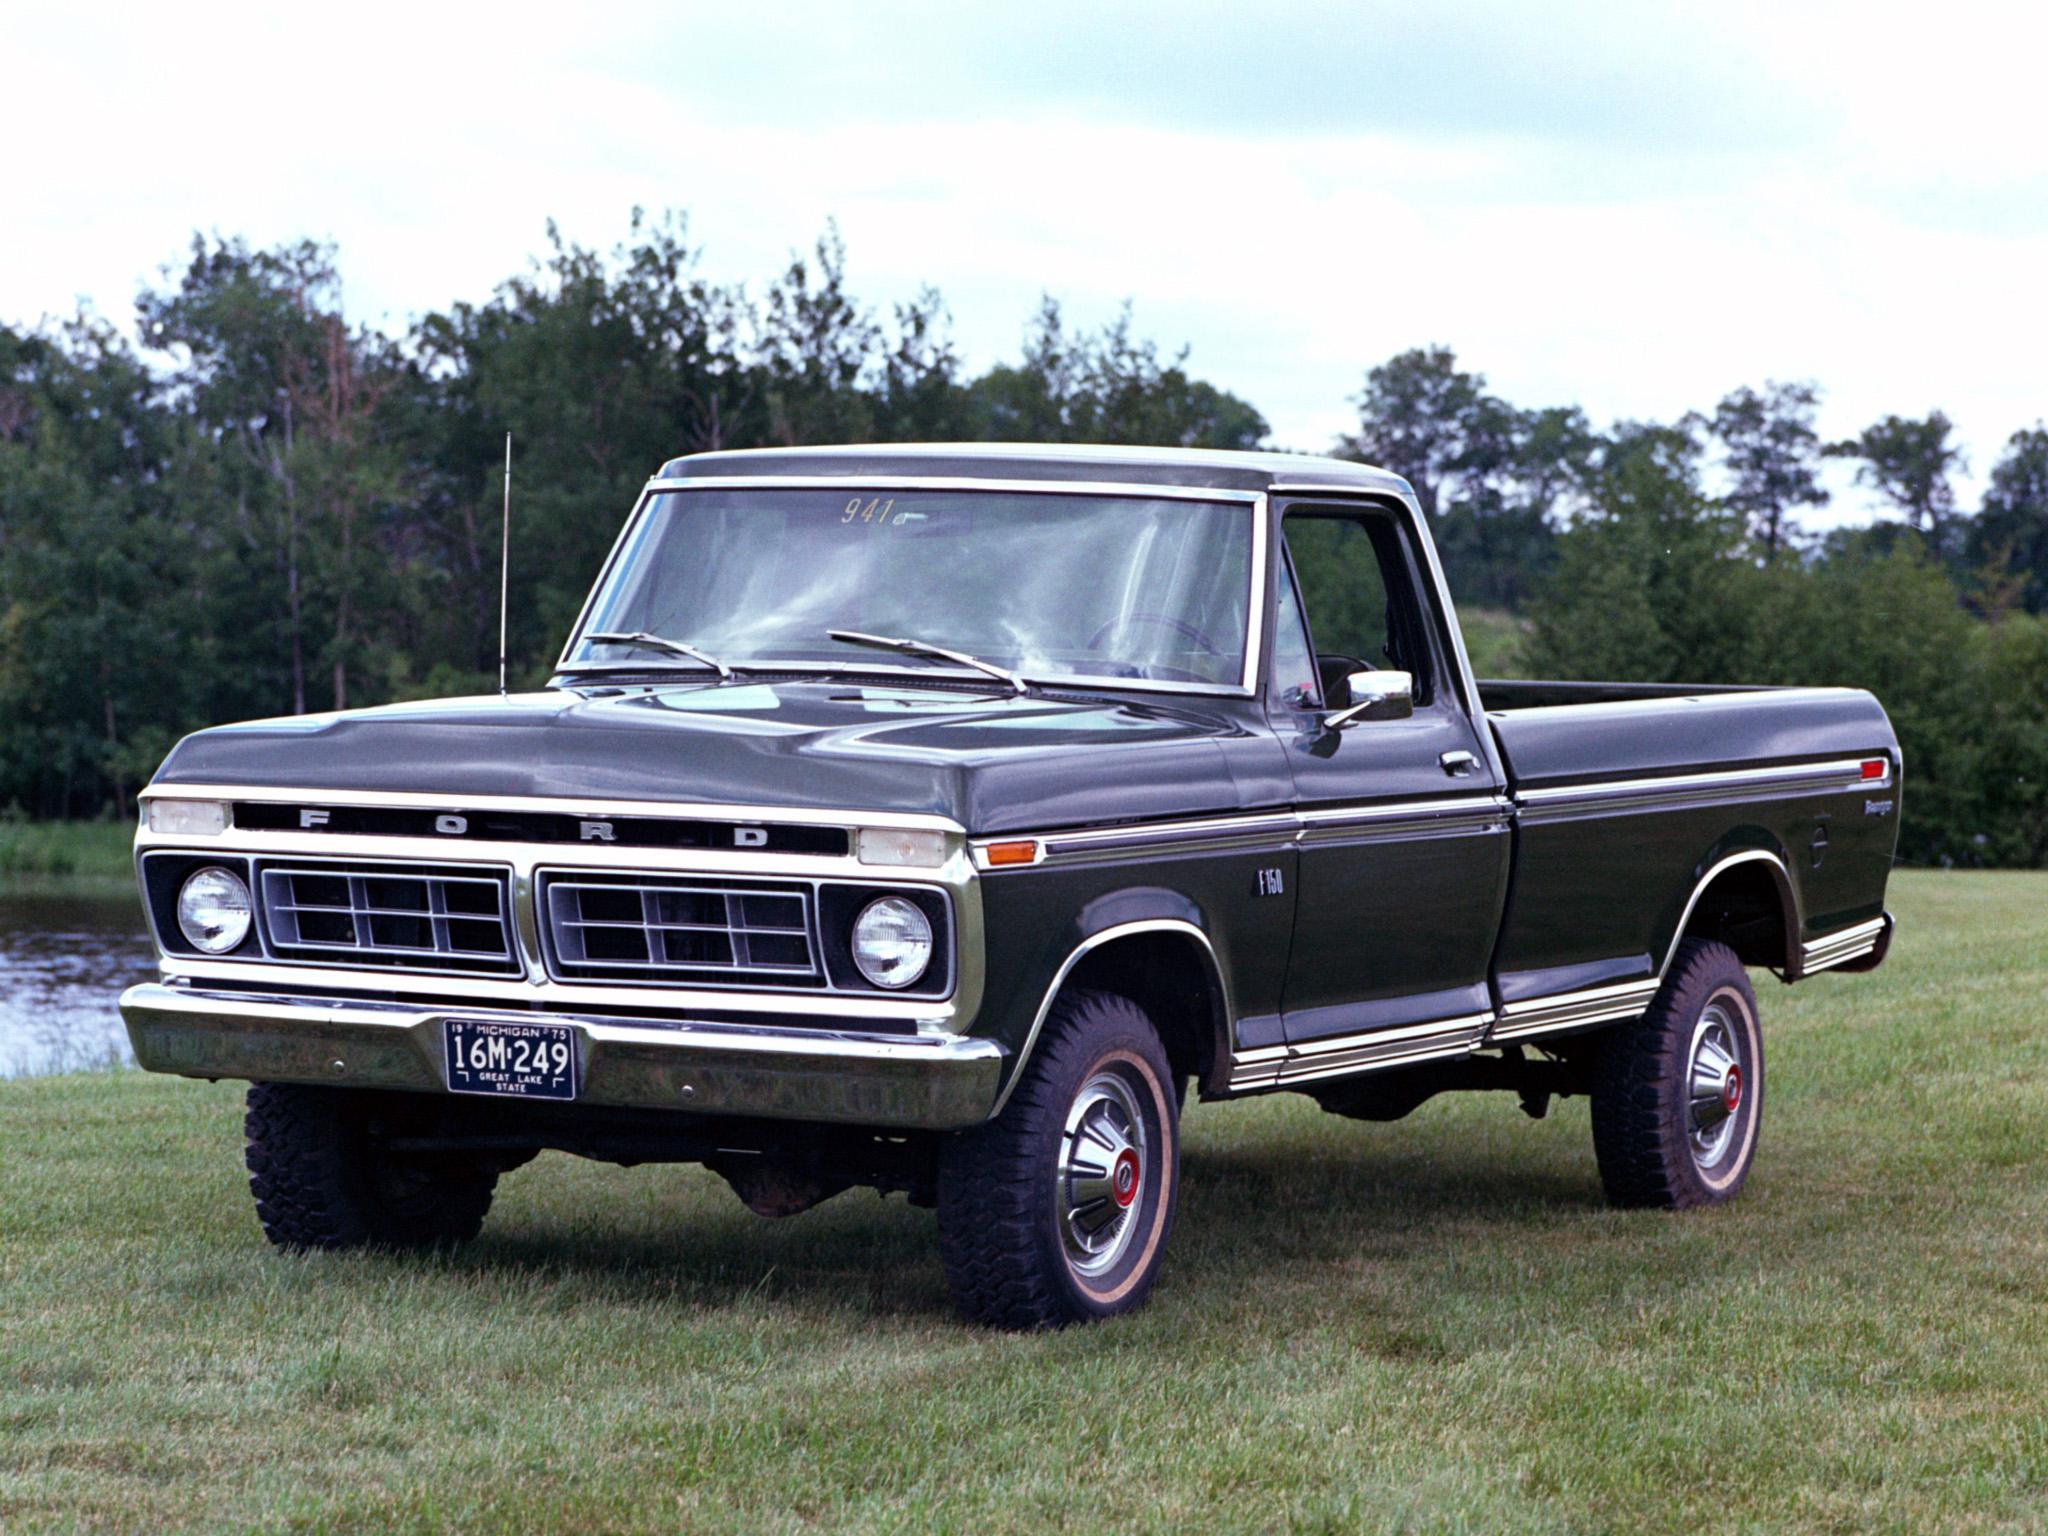 1976 Ford F 150 Ranger 4x4 pickup wallpaper background 2048x1536